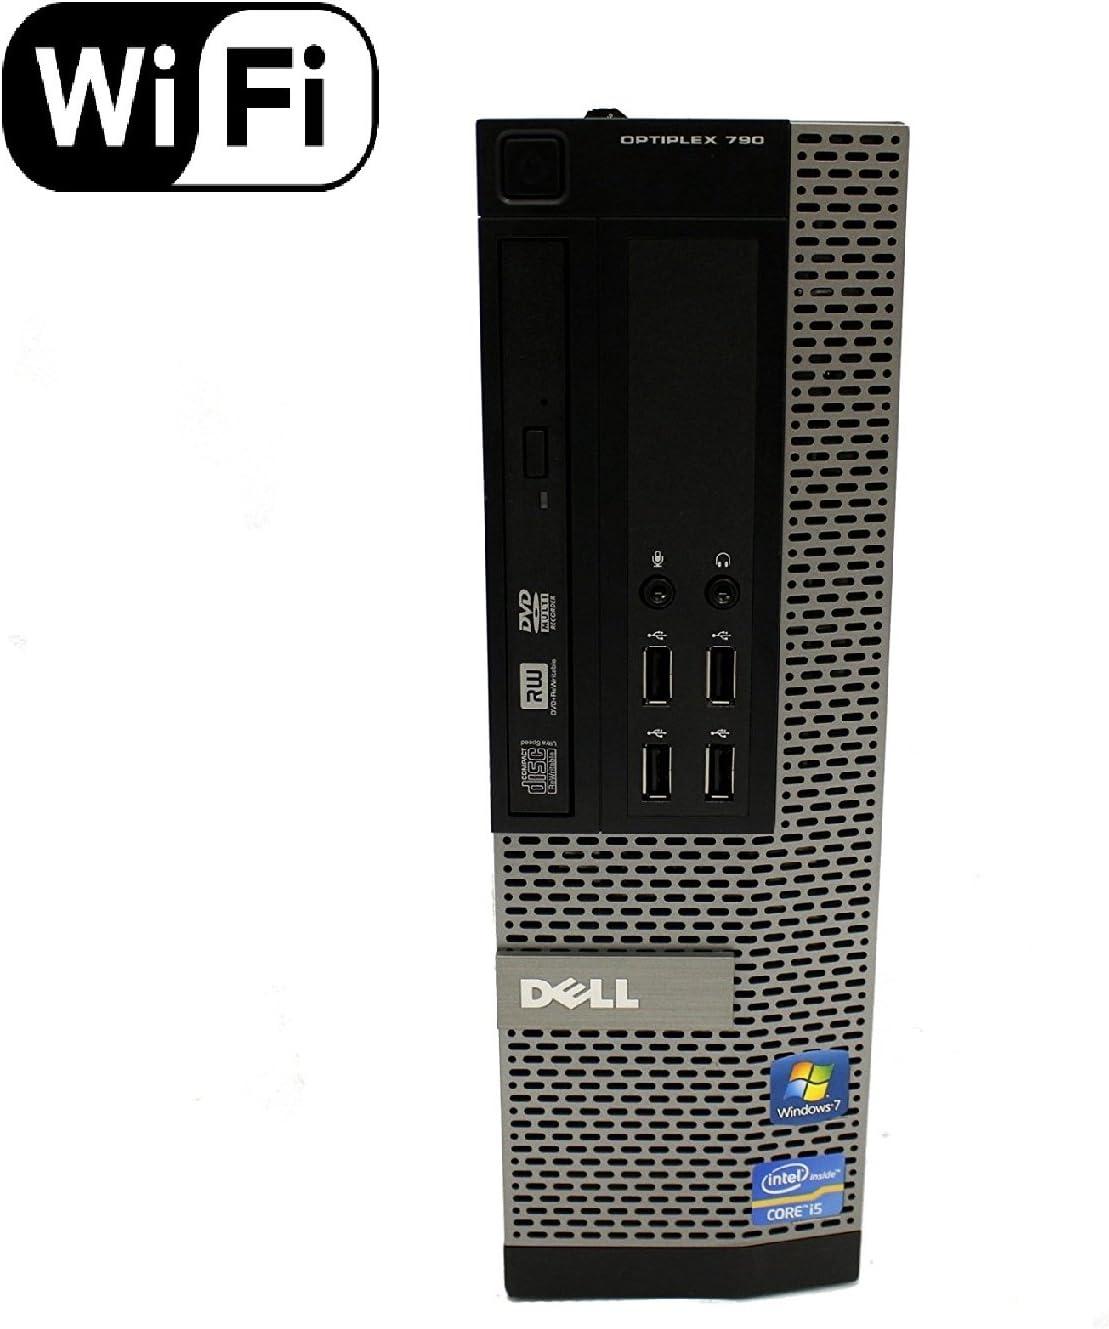 Dell Optiplex 790 SFF Small Form Factor Business Desktop Computer PC Intel Dual Core i3 CPU 3.3GHz, 4GB DDR3 Memory, 500GB HDD, DVDRW, Windows 10 Professional Renewed